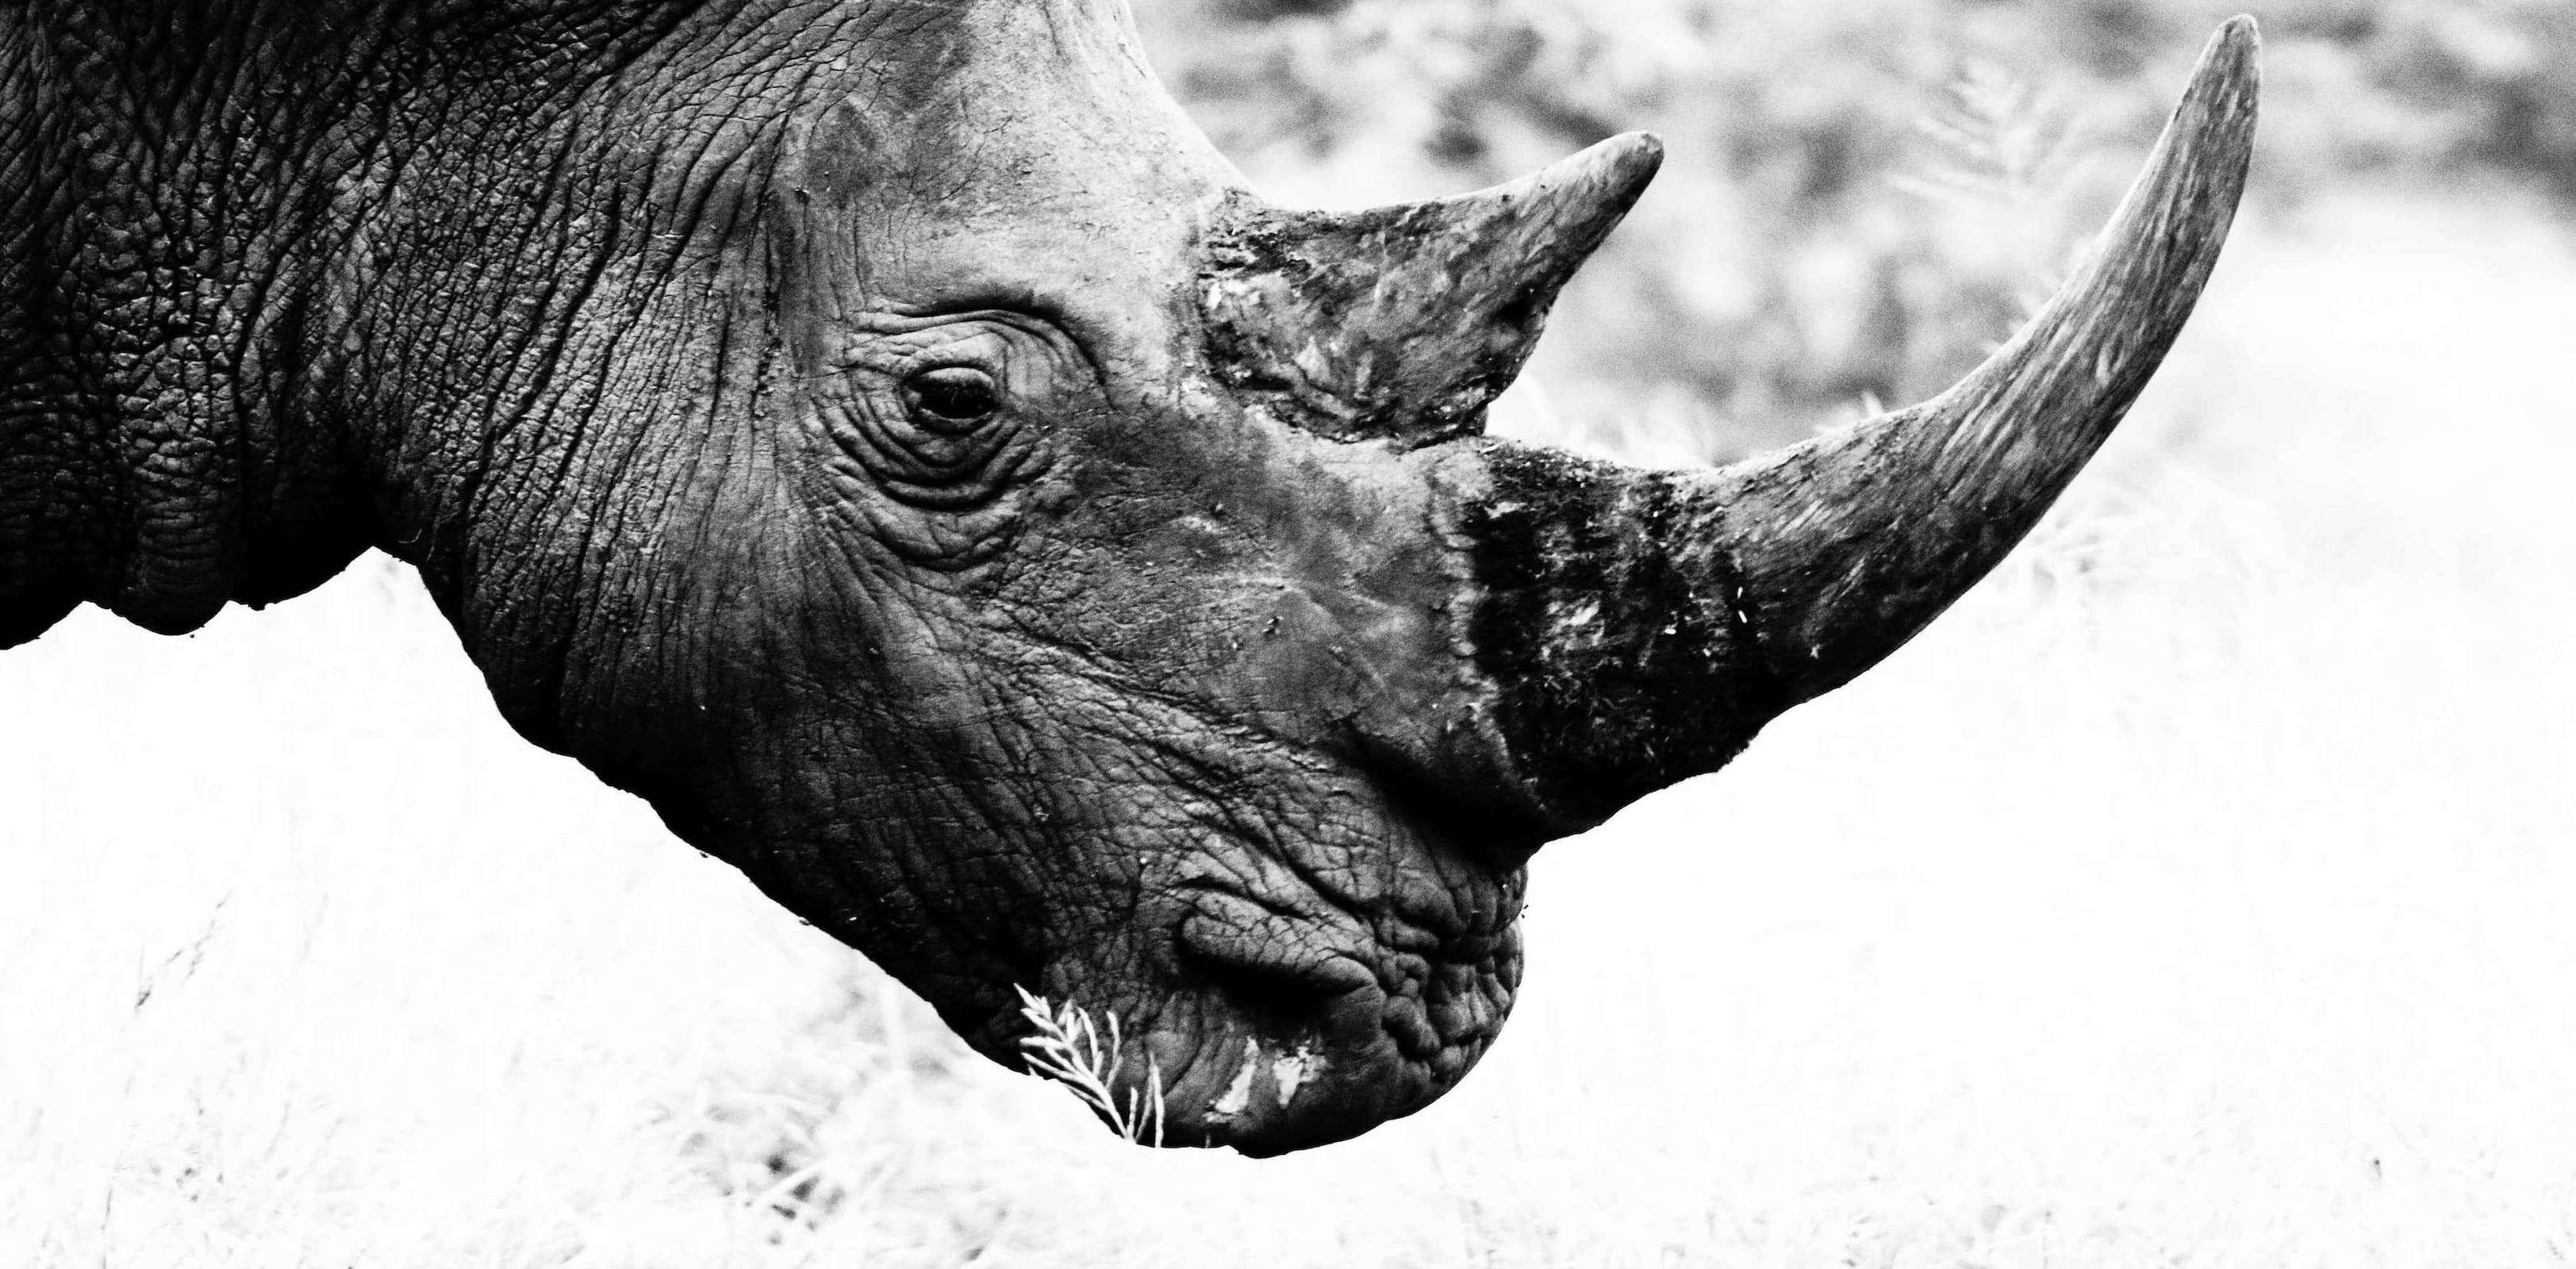 Follow The Guns Report on Rhino Poaching and Wildlife Crime